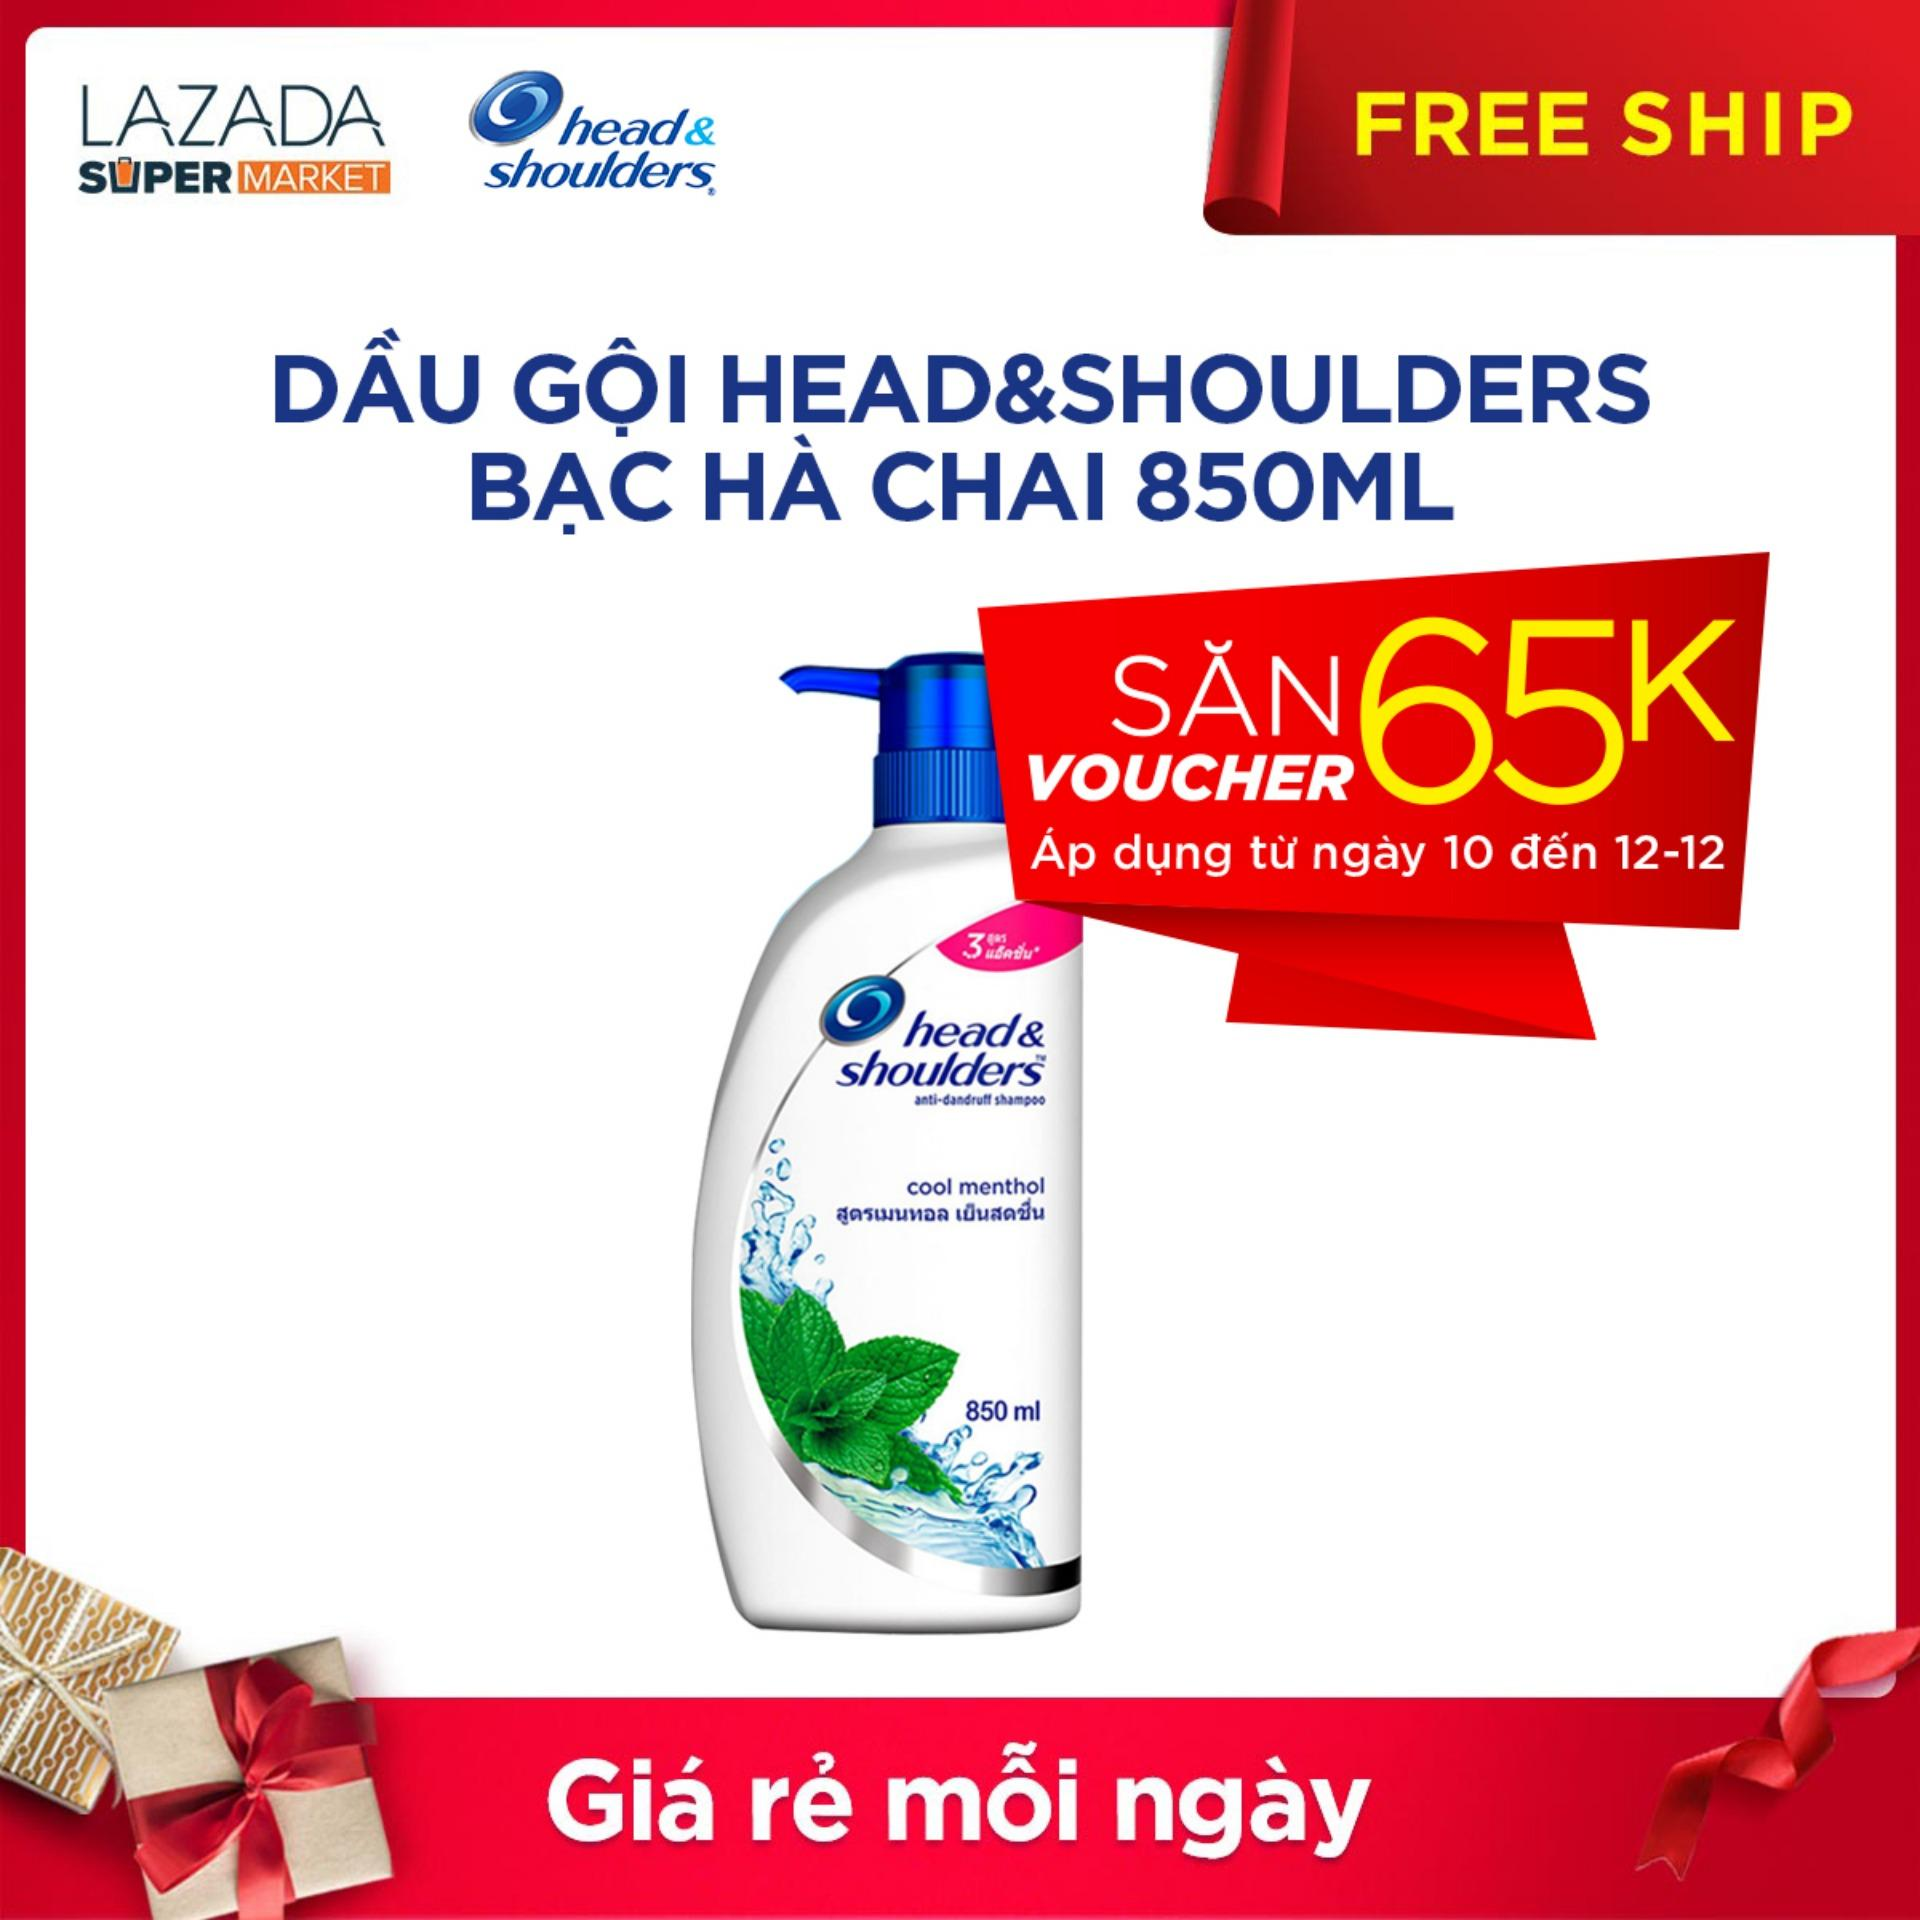 Dầu Gội Head&Shoulders Bạc Hà chai 850ML